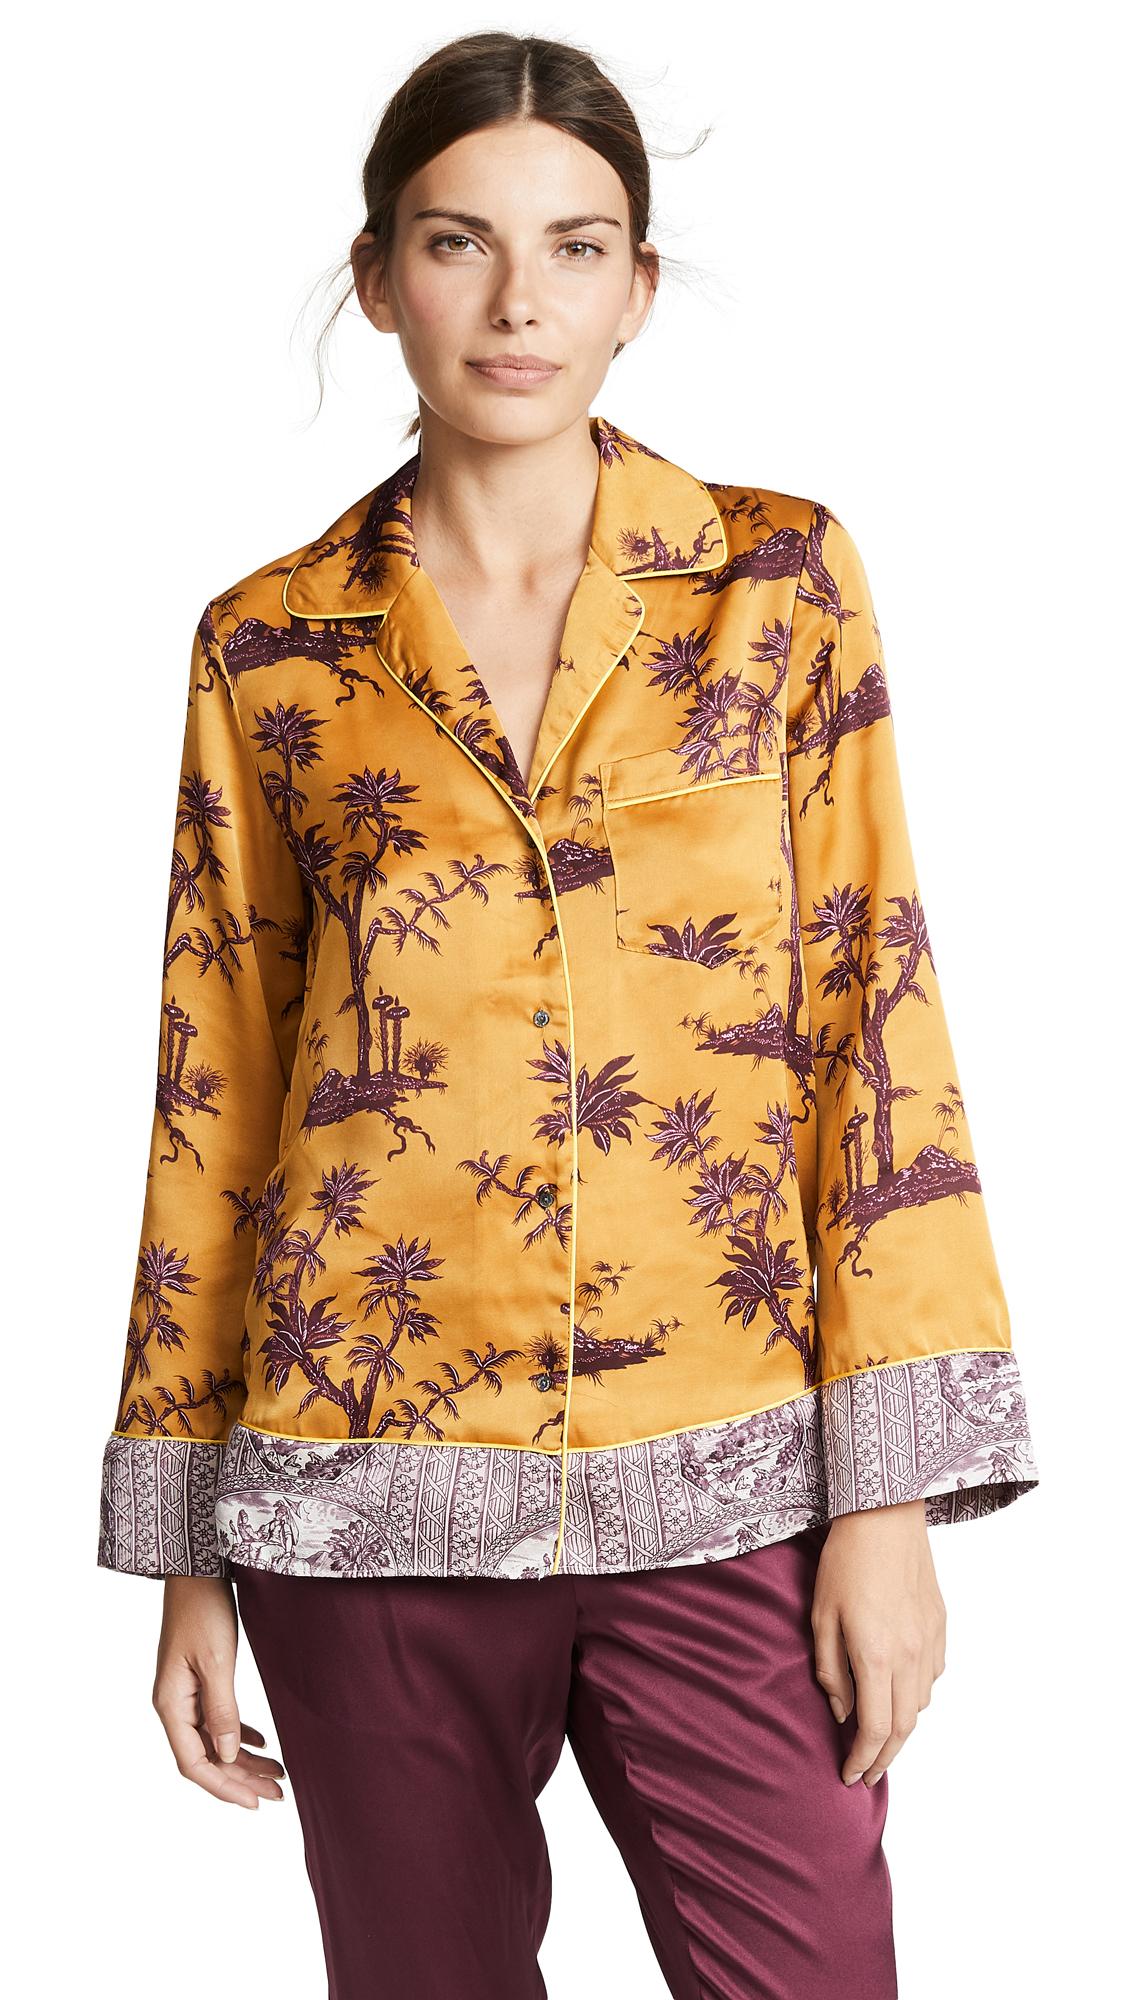 SCOTCH & SODA/MAISON SCOTCH Pyjama Shirt in Combo A